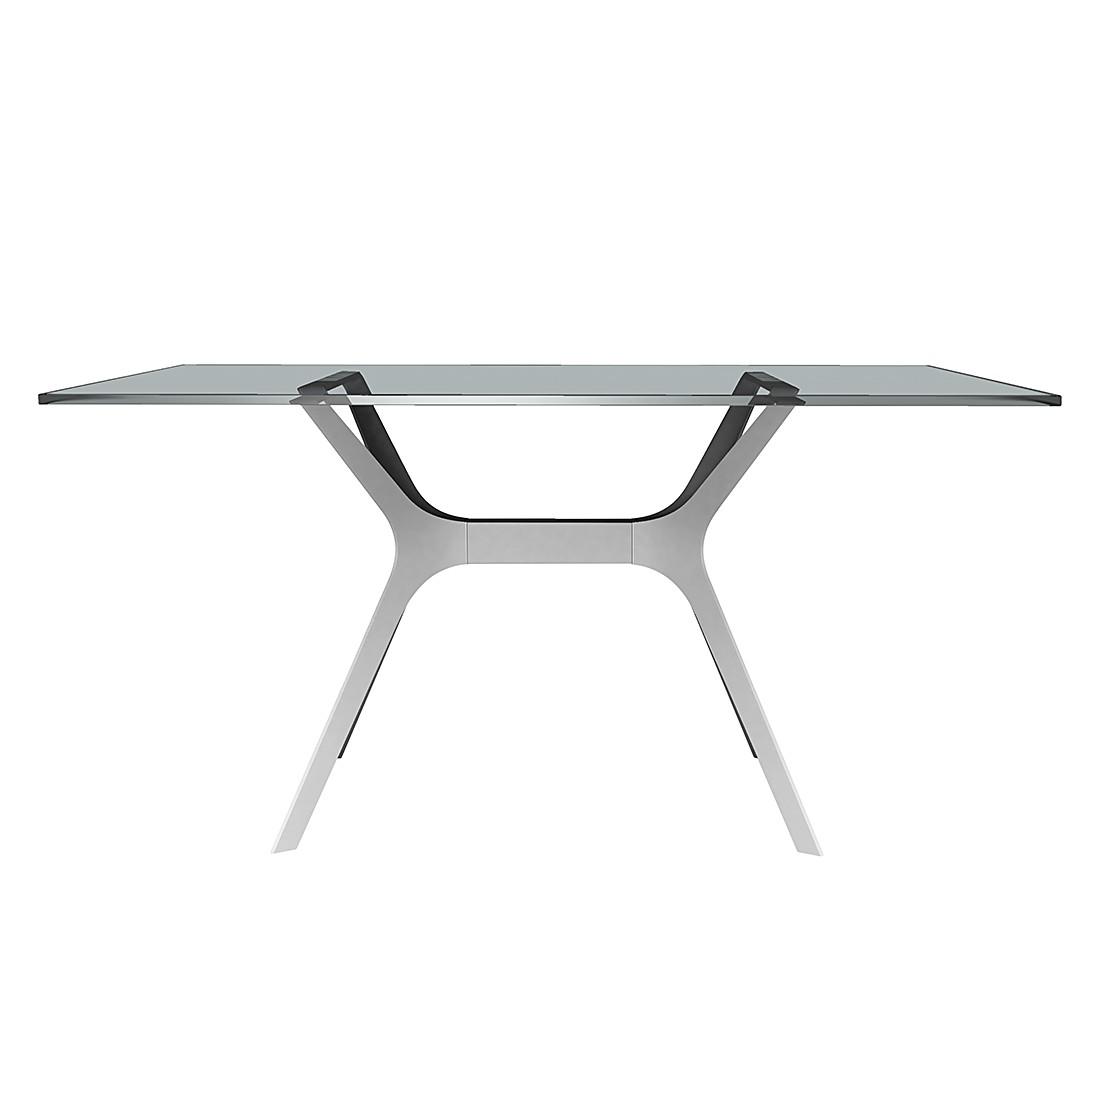 Table à manger Vela I - Blanc - 120 x 80 cm, loftscape